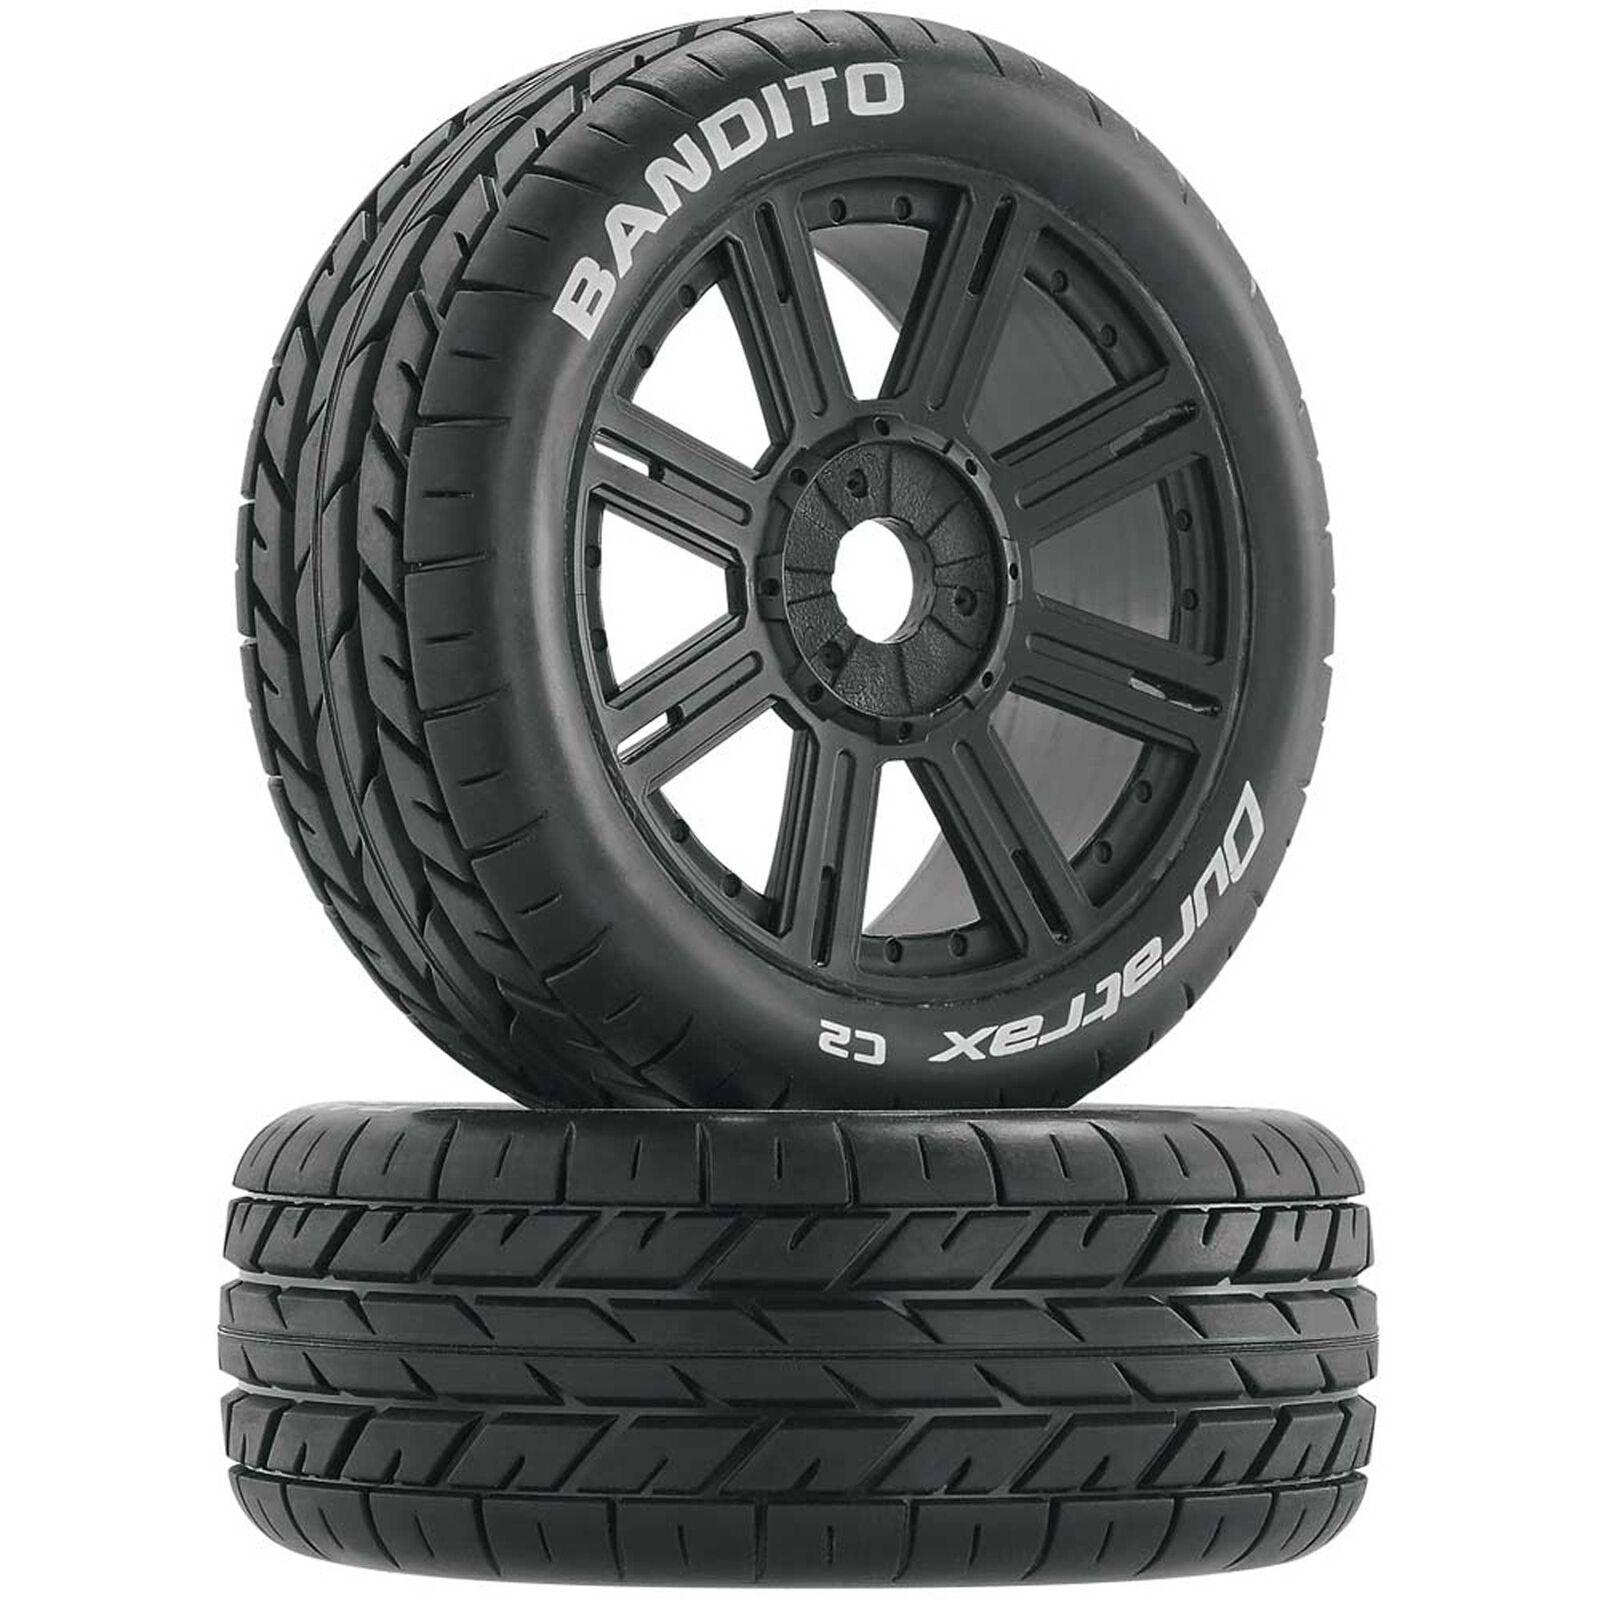 Bandito 1/8 Buggy Tire C2 Mounted Spoke Tires, Black (2)